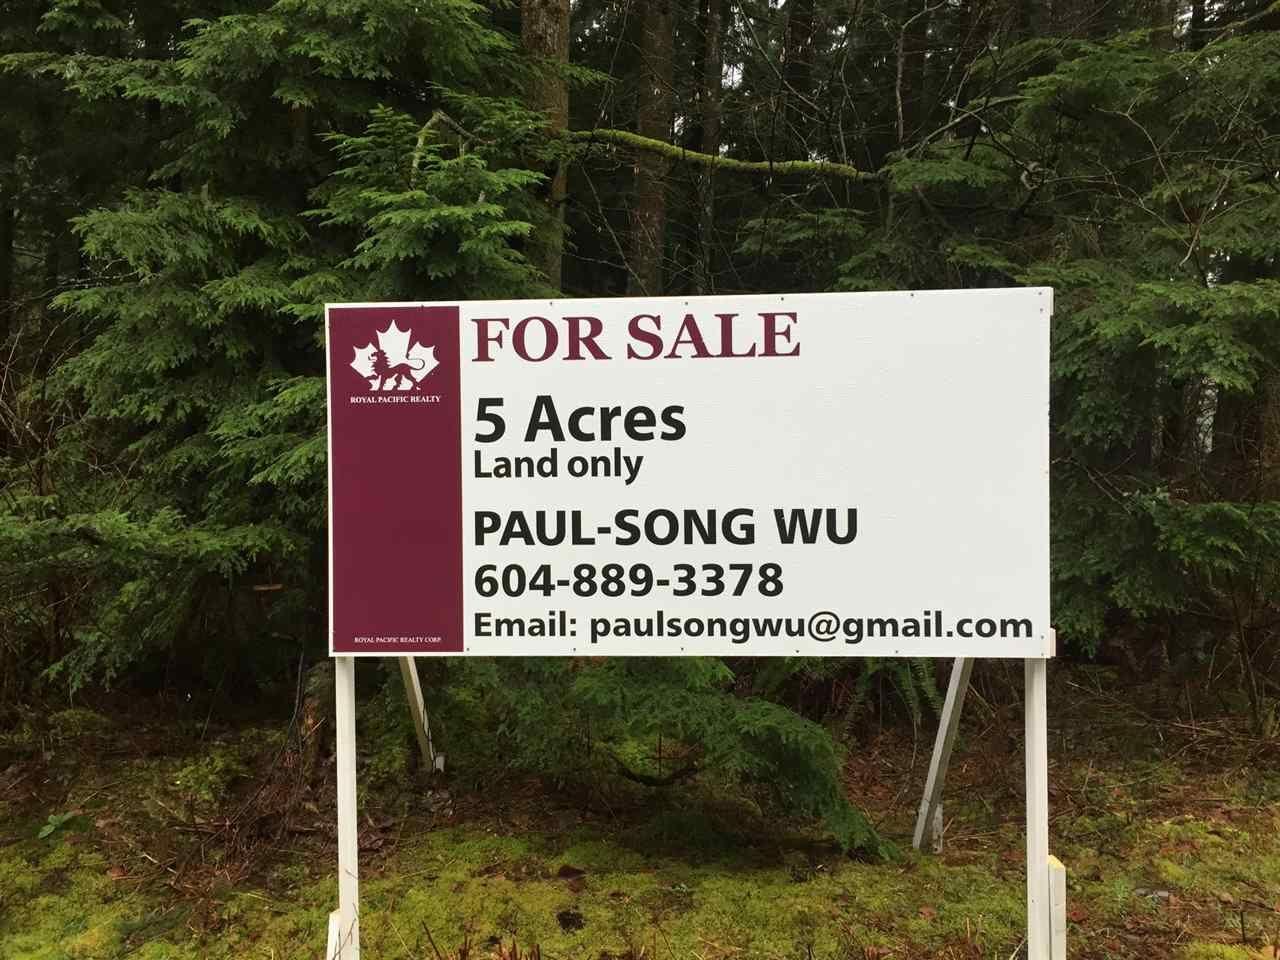 Main Photo: LOT 26 112TH AVENUE in Maple Ridge: Whonnock Land for sale : MLS®# R2029047